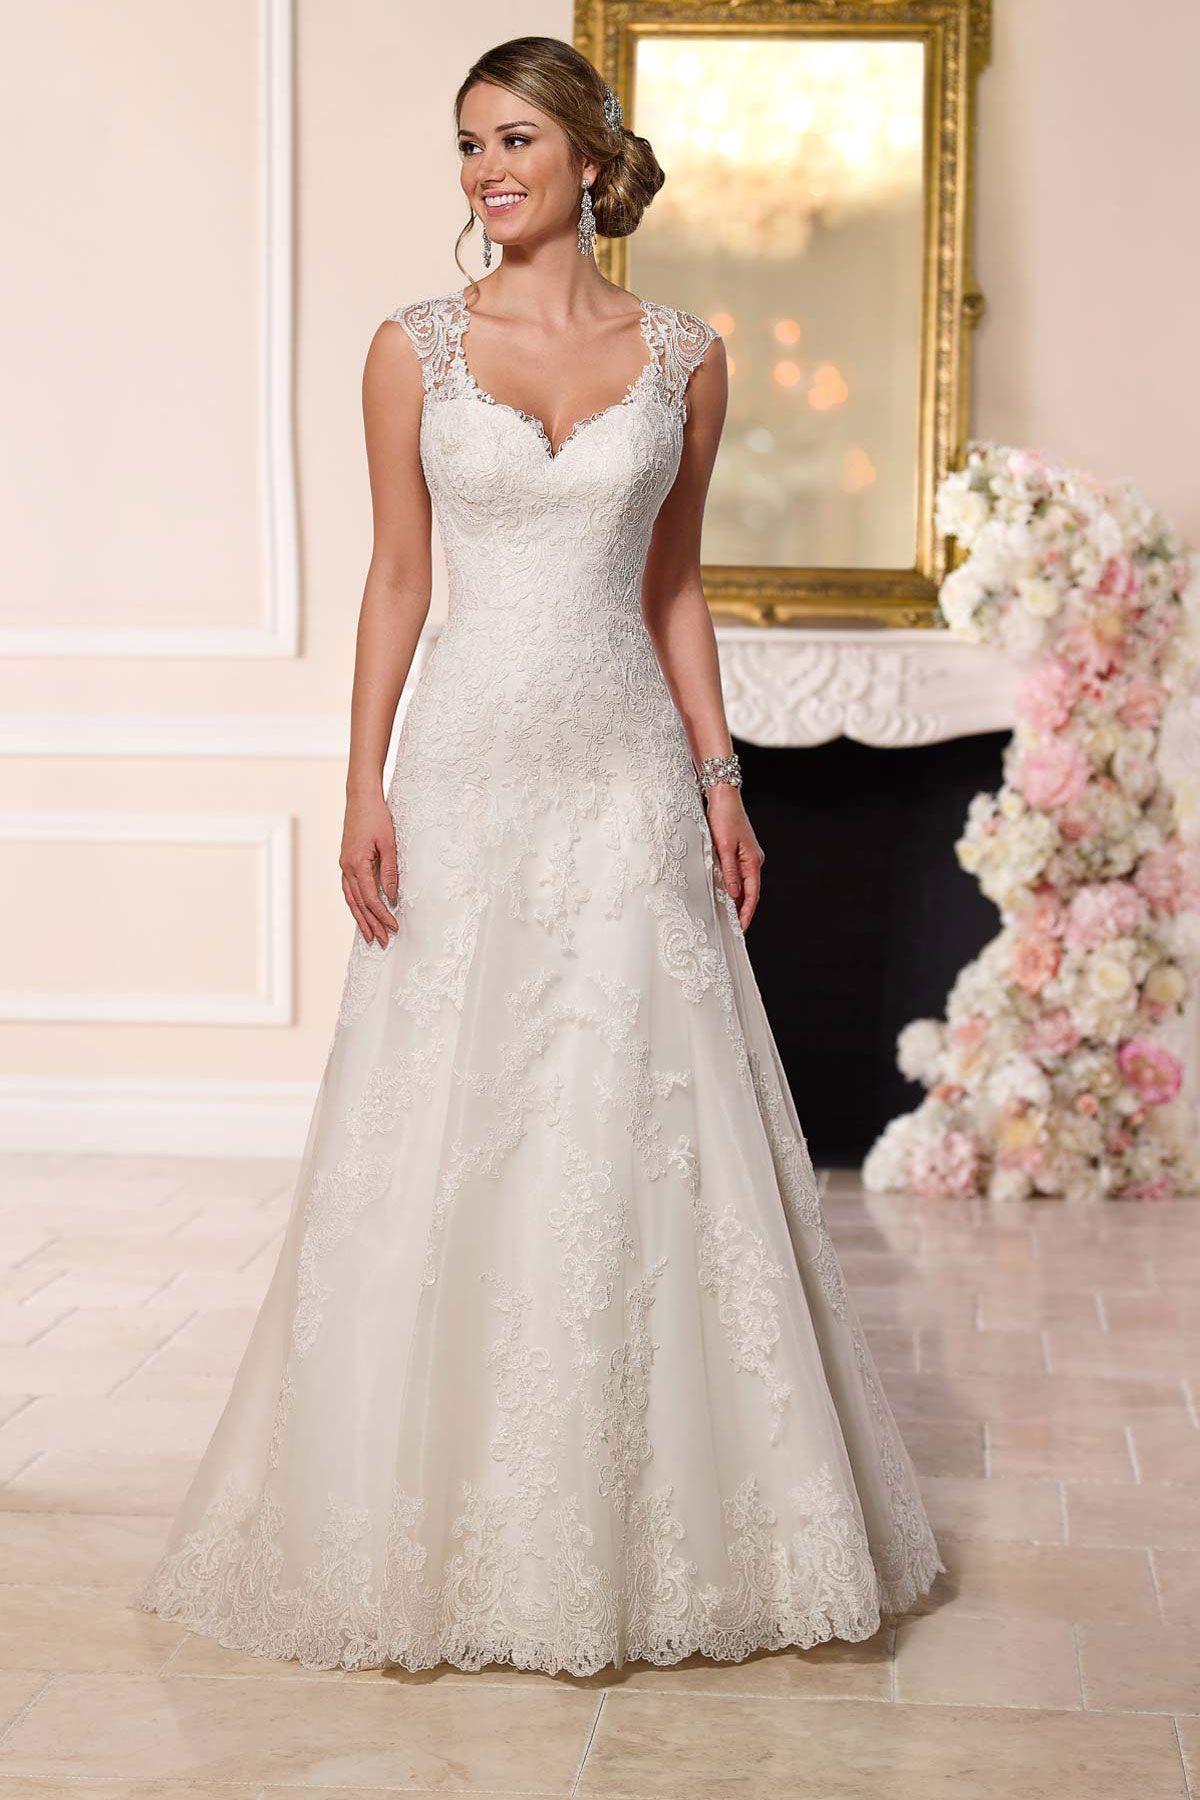 Lace cap sleeve a line wedding dress  Stella York  Barton A line wedding gown from Stella York boasts